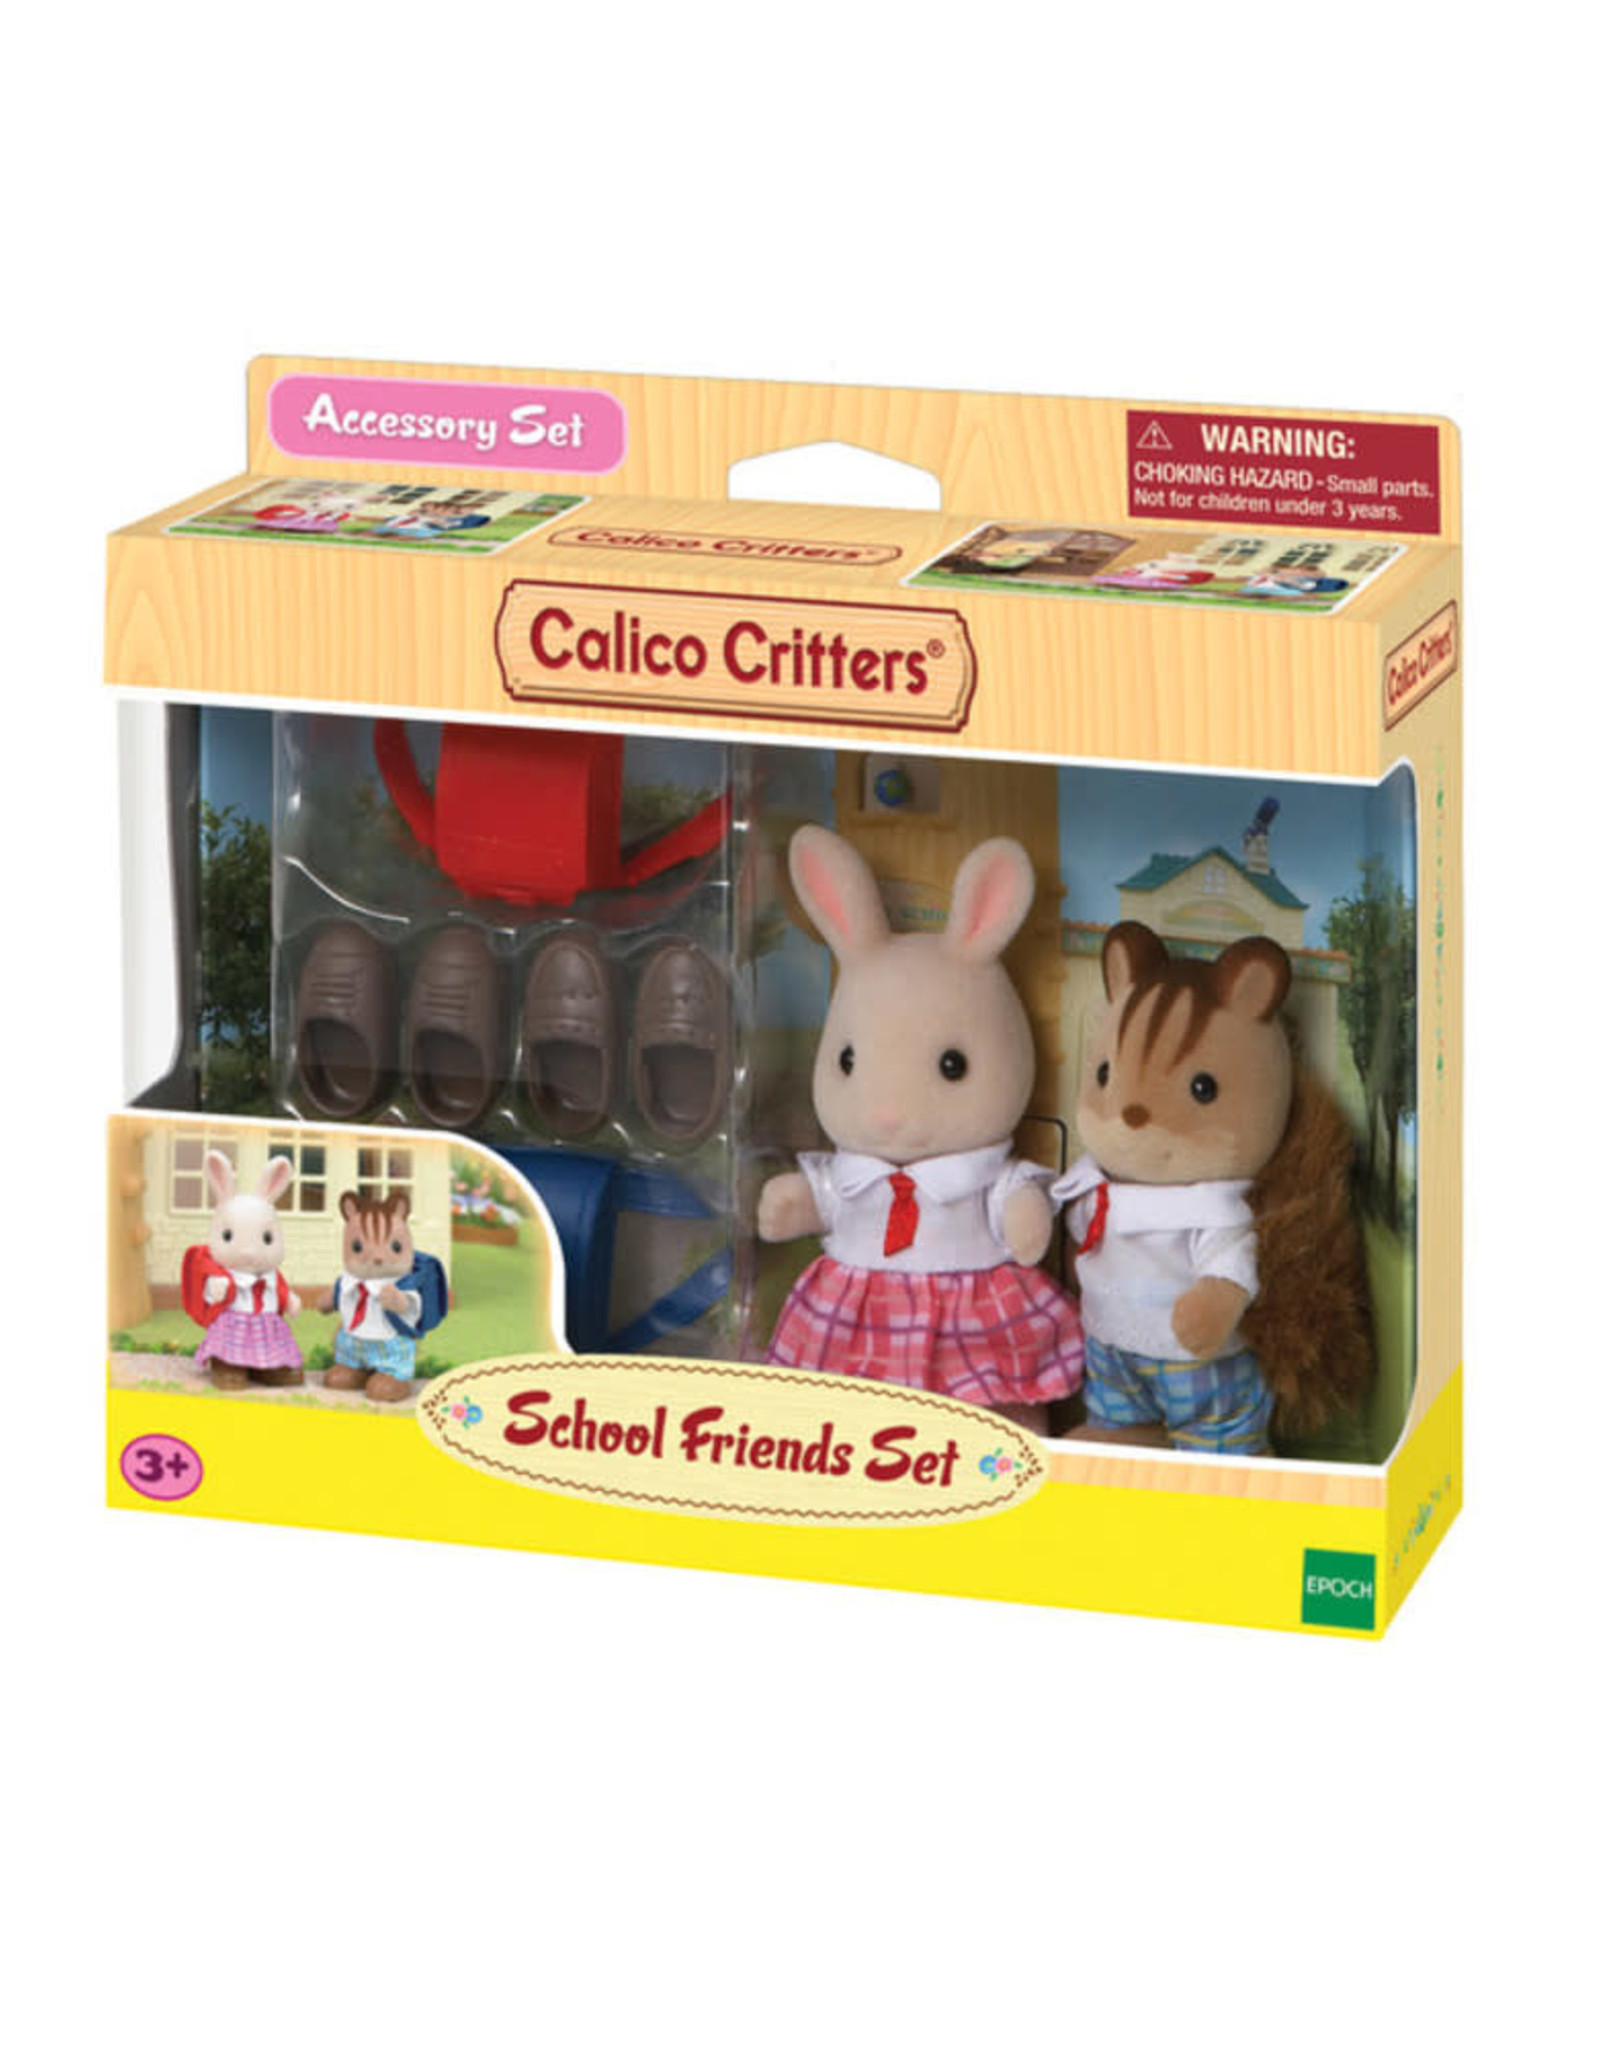 Calico Critters: School Friends Set